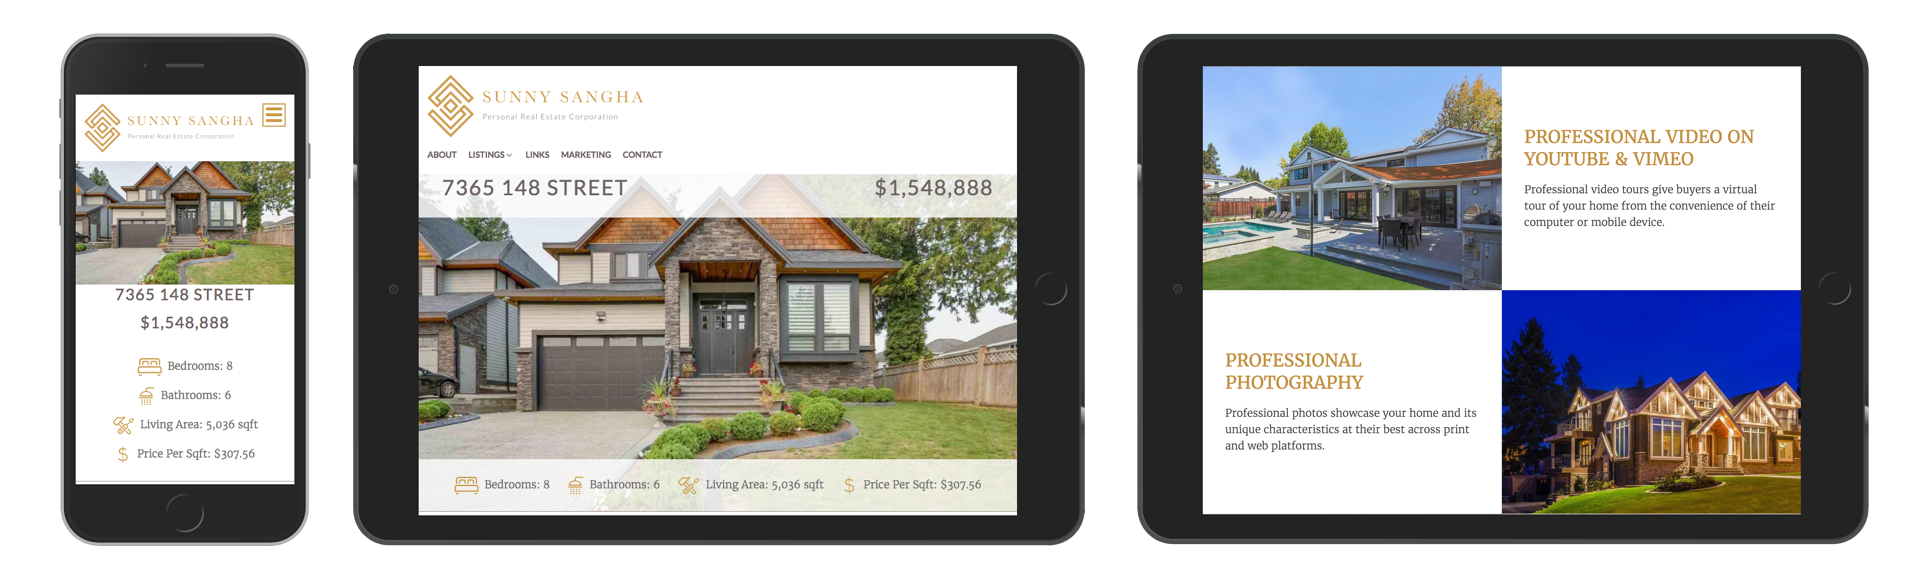 Sunny Sangha Realtor Branding website design mobile and tablet display